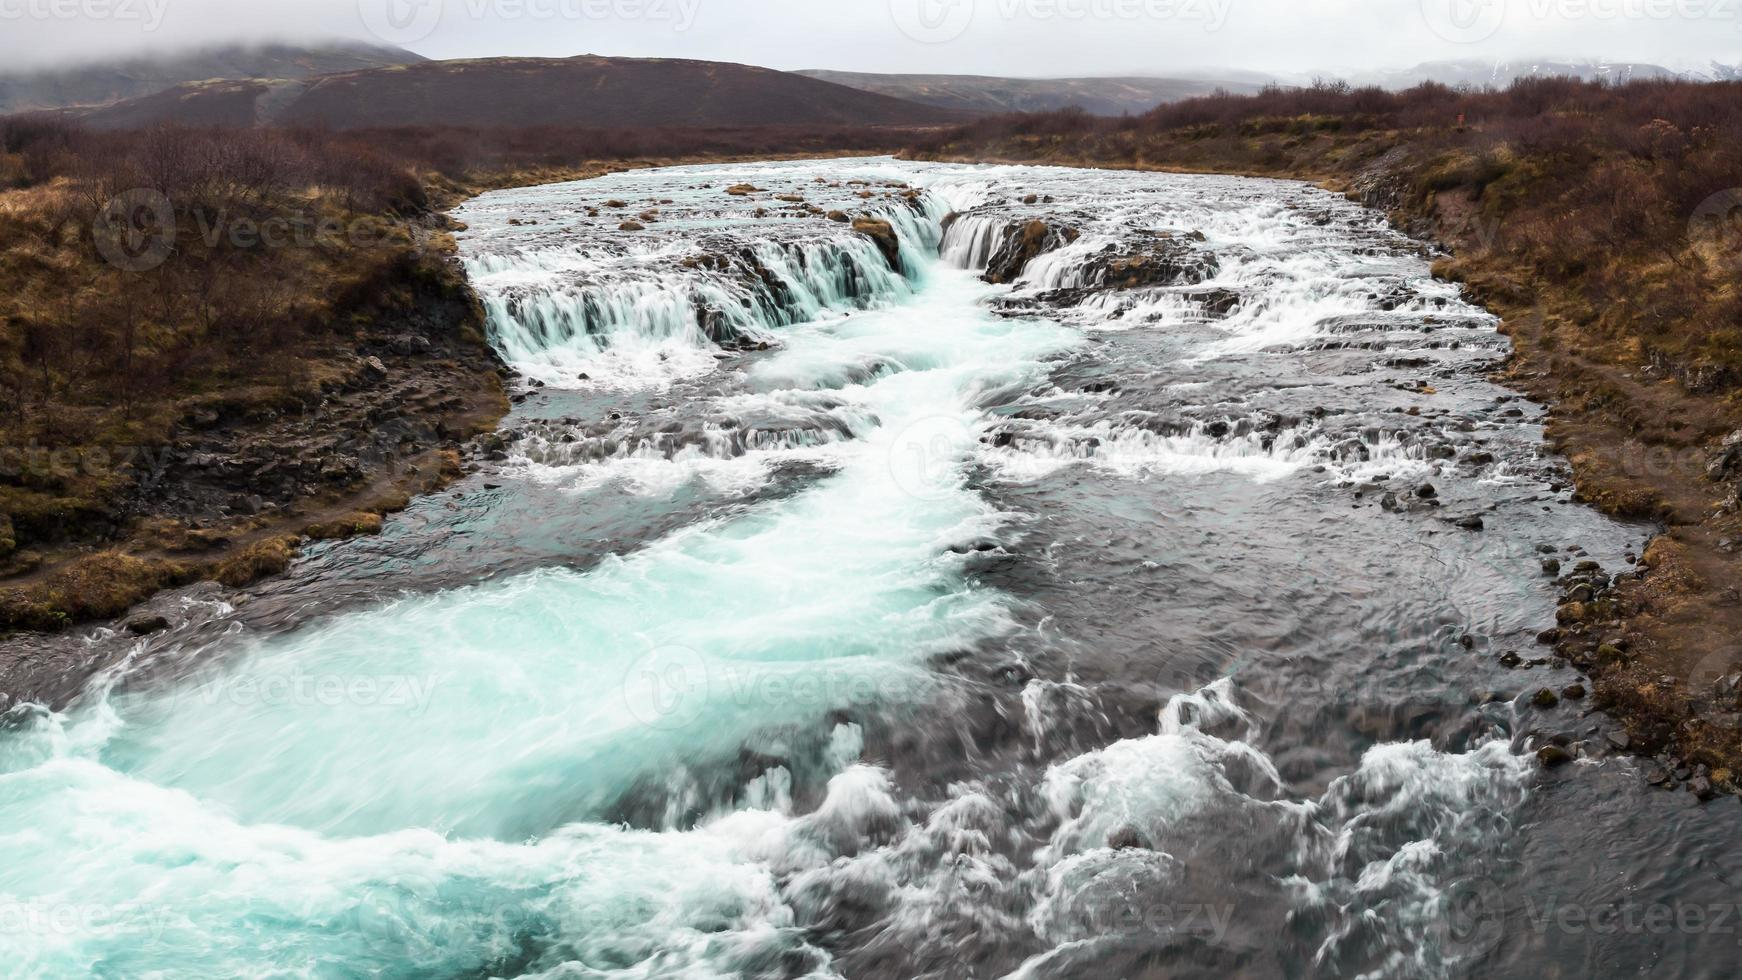 Bruarfoss (Bridge Fall), is a waterfall on the river Bruara photo